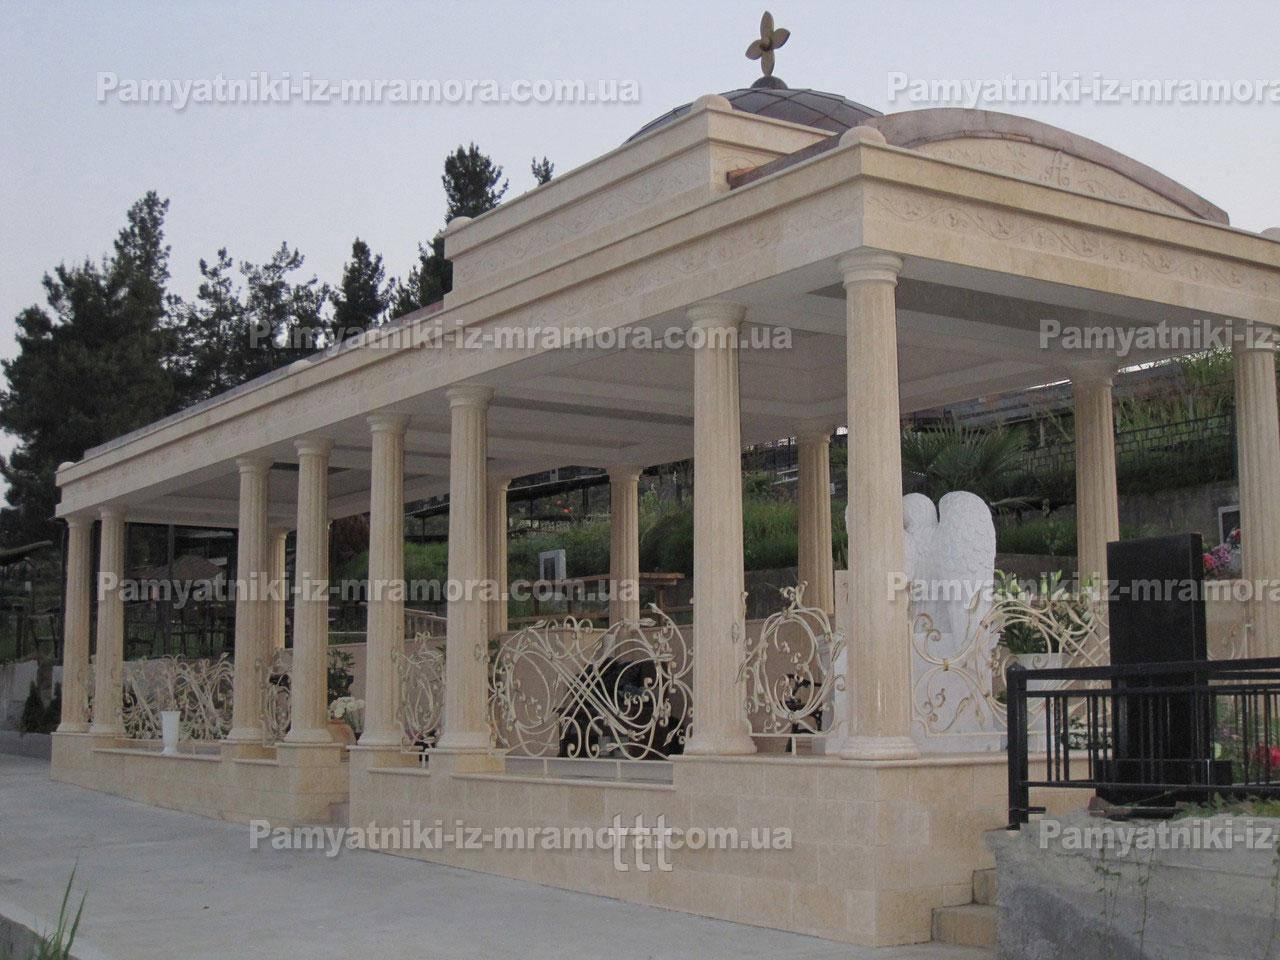 Комплекс из мрамора с колоннами №13